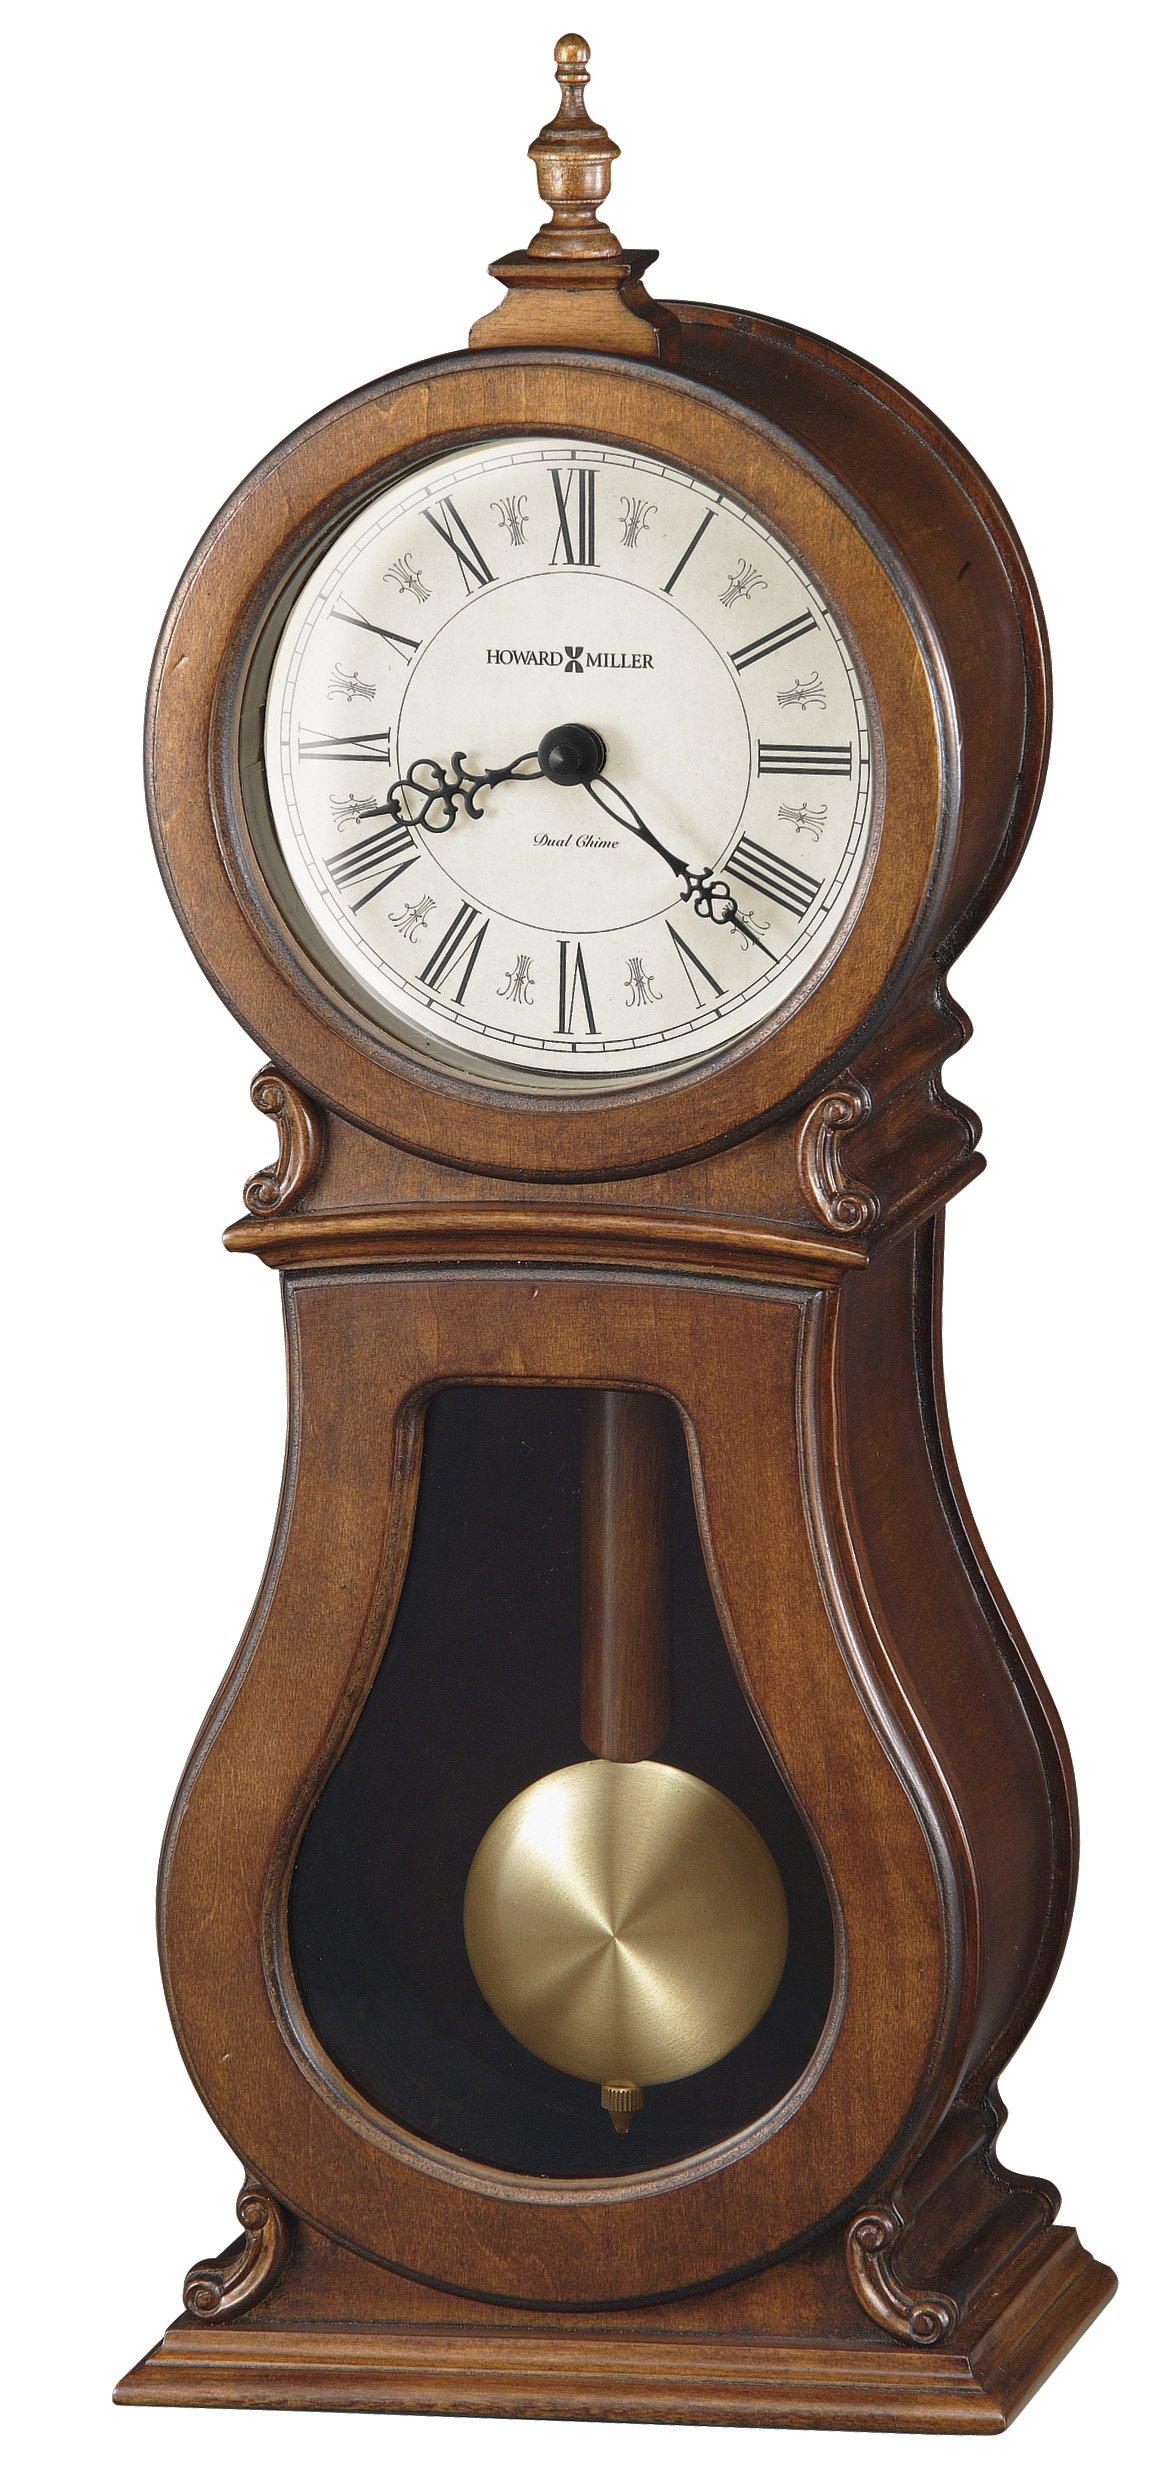 Howard Miller 635-146 Arendal Mantel Clock by Howard Miller